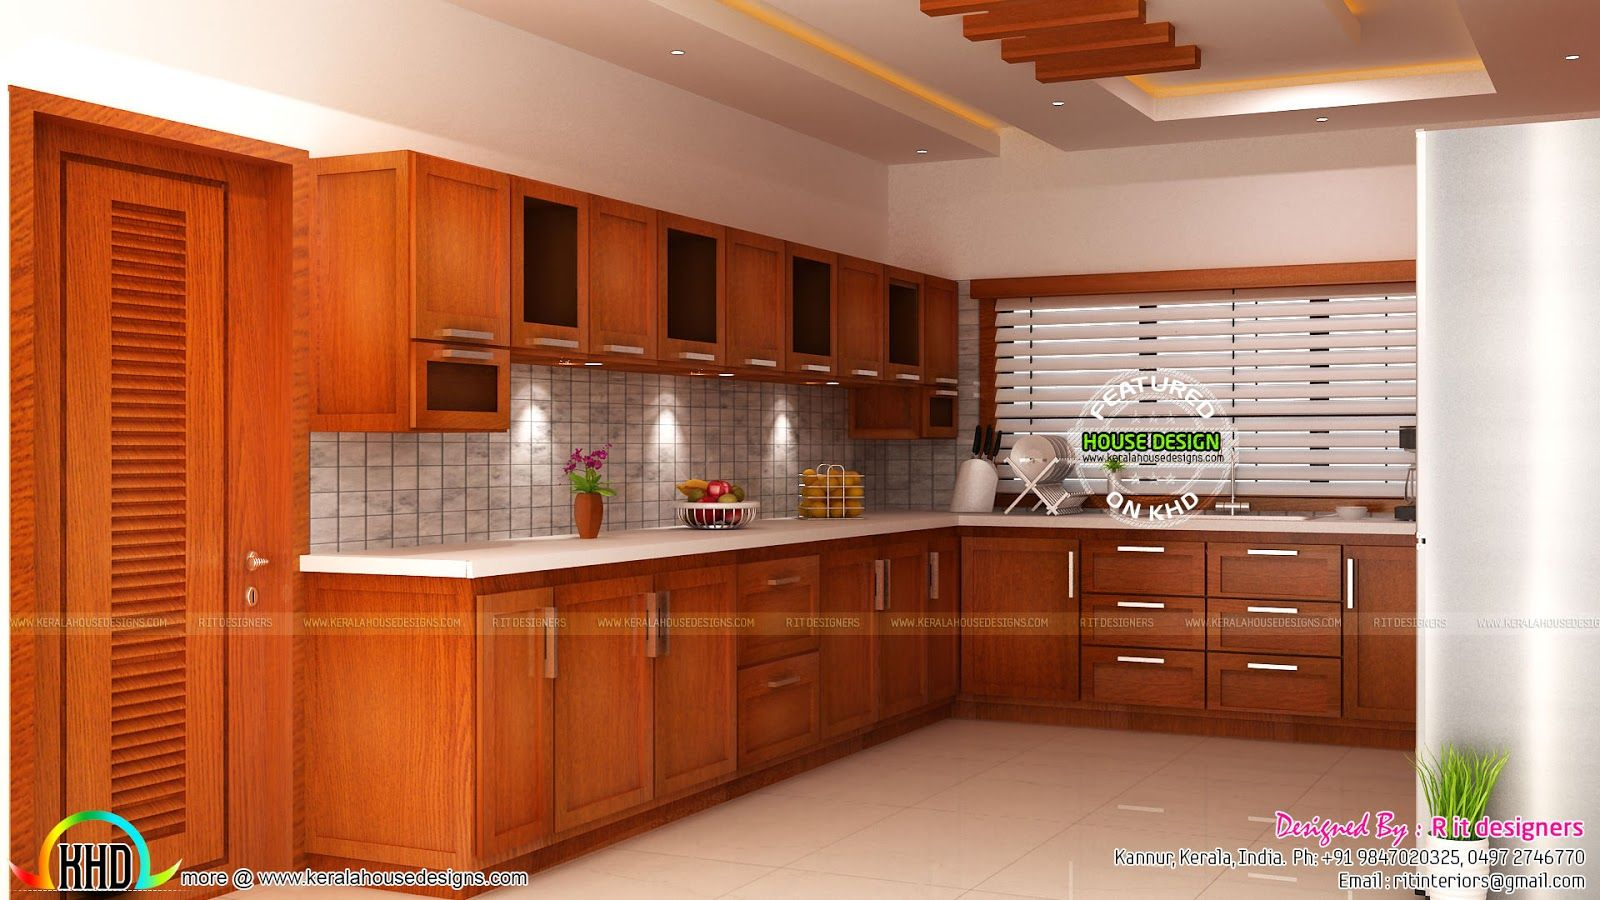 Traditional Kerala Kitchen Designs Photo Gallery   Novocom.top